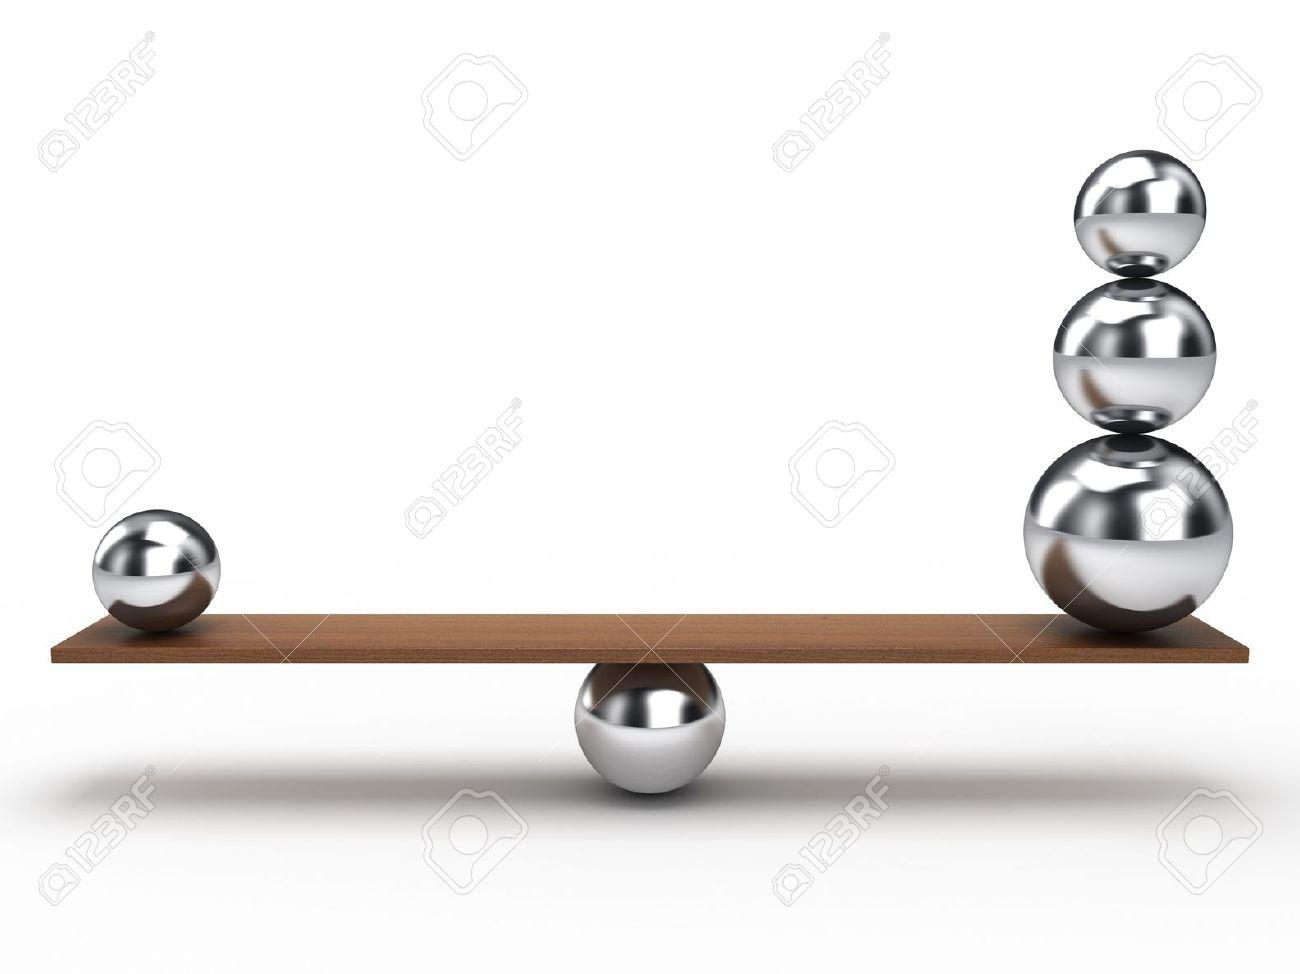 Balancing Balls On Wooden Board Stock Photo   9325101